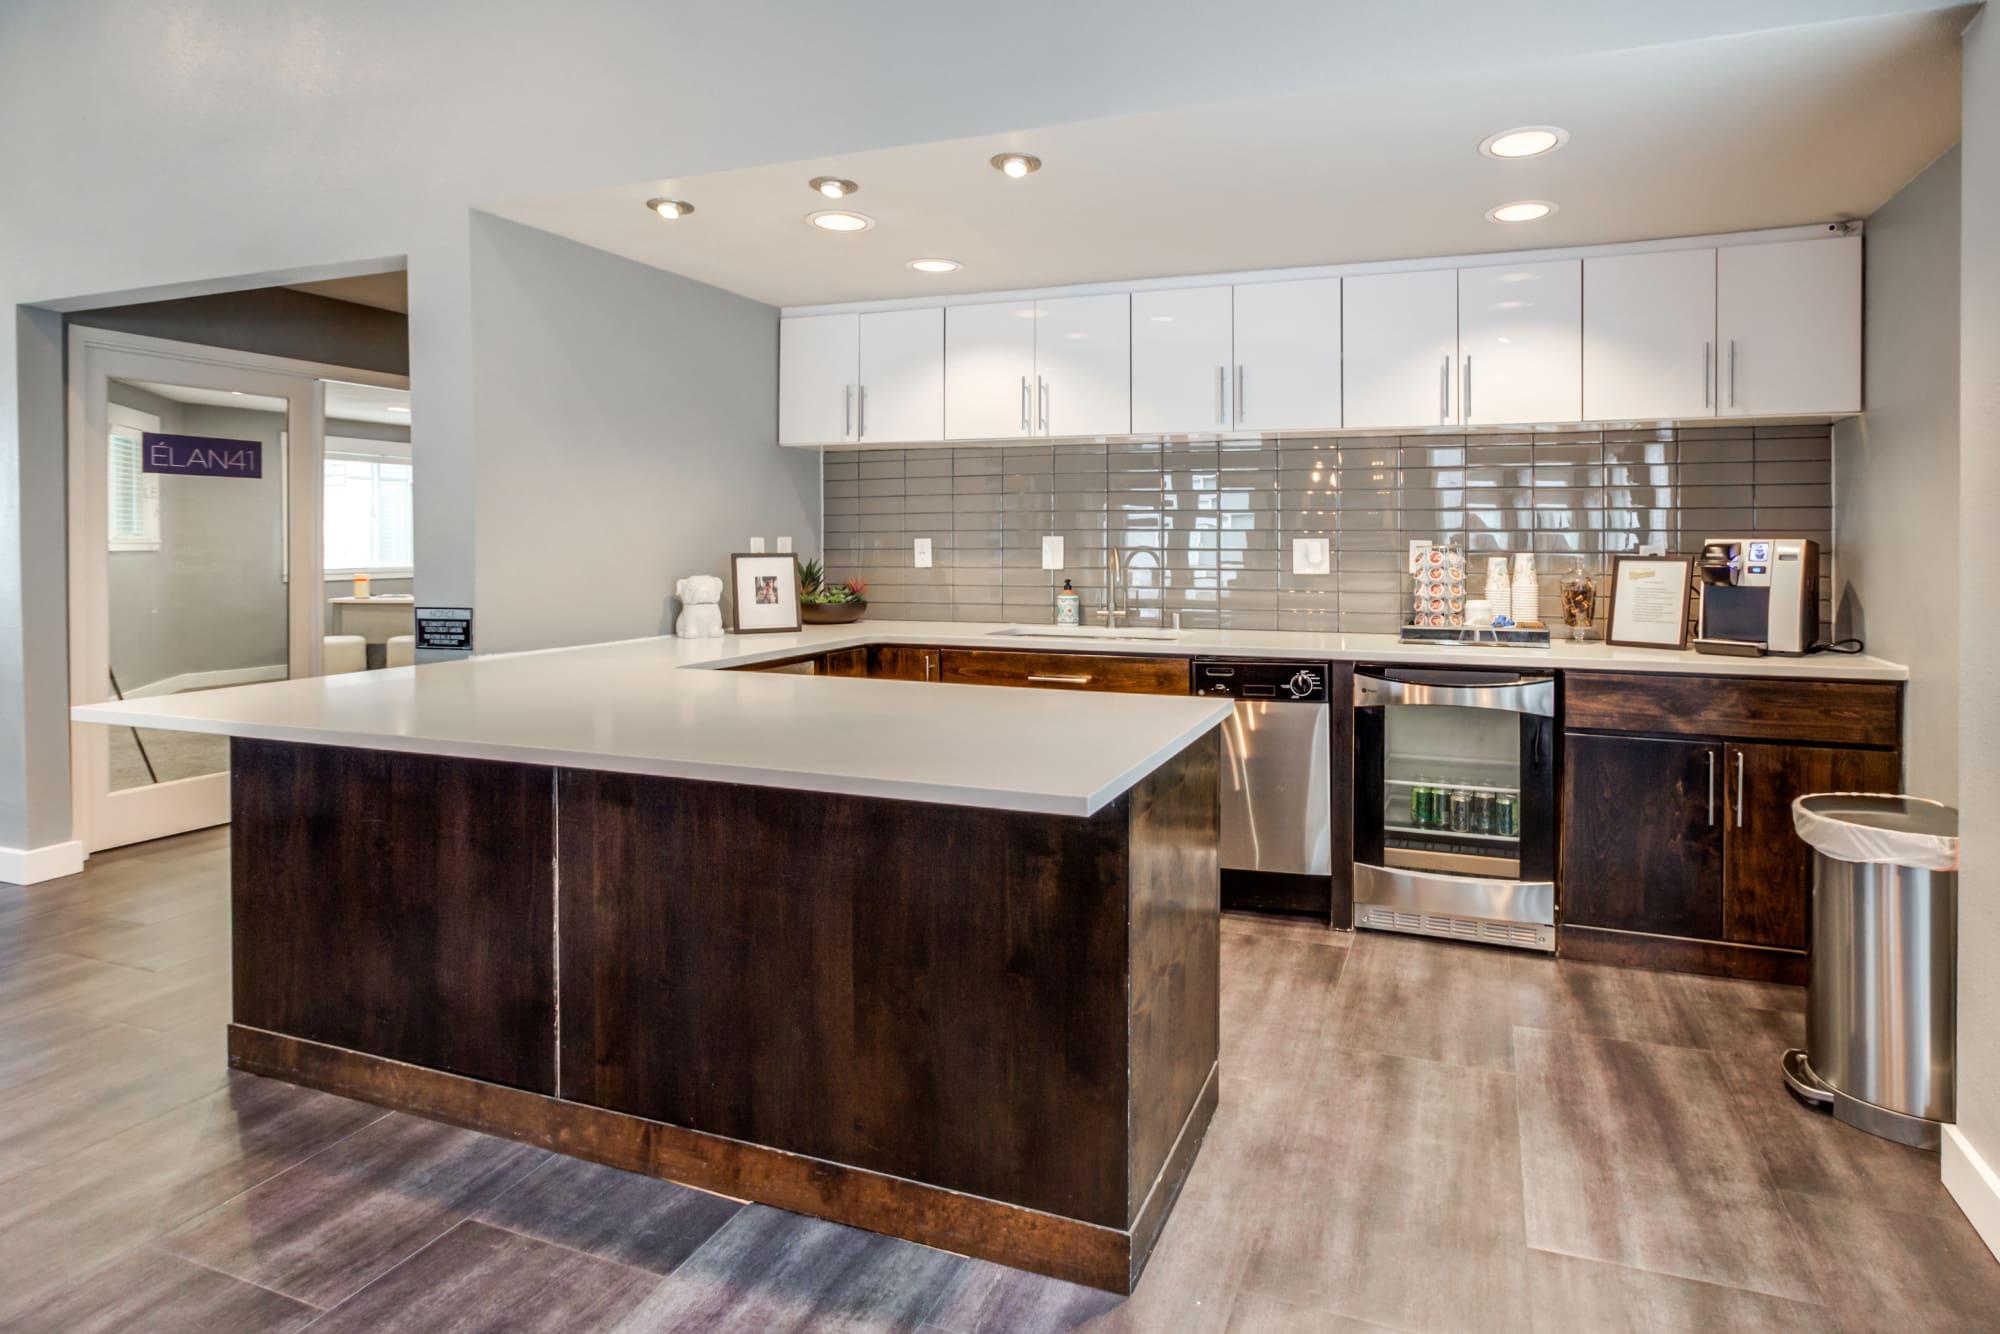 Clubhouse Kitchen at Elan 41 Apartments in Seattle, WA